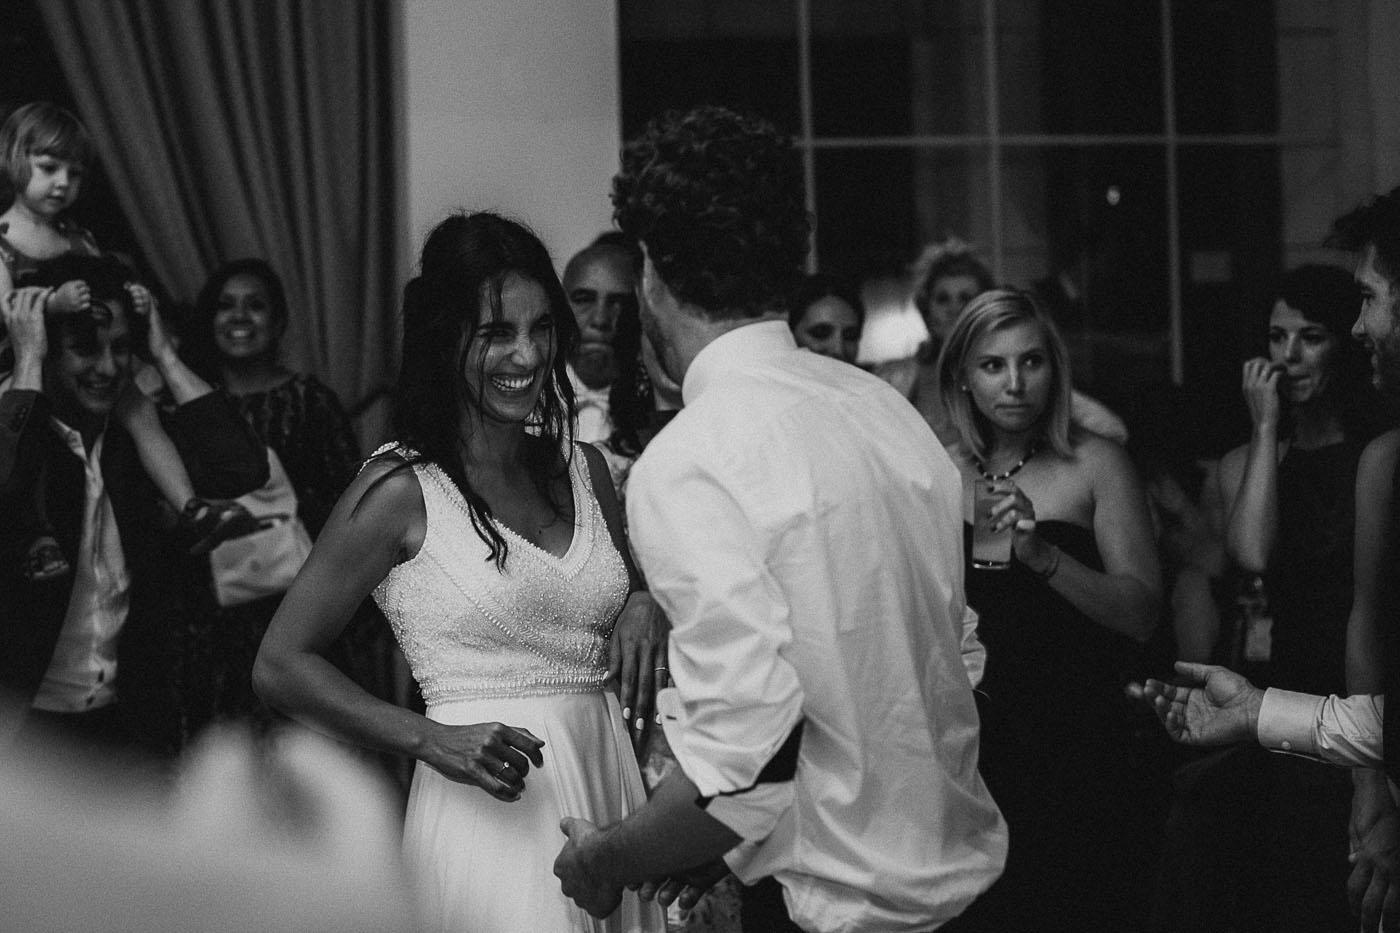 wedding-leopoldskron-photographer-94